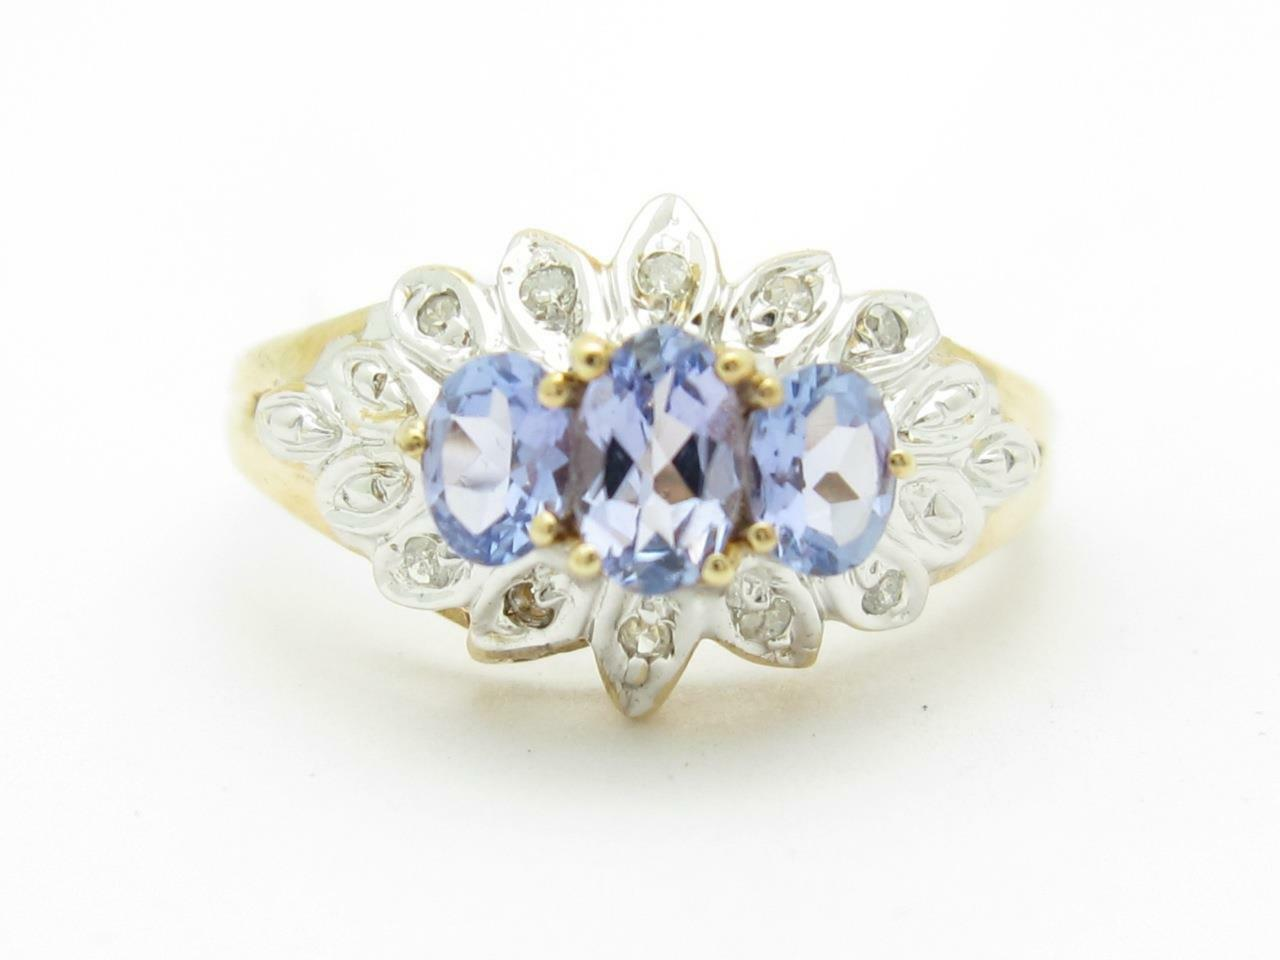 14k Solido oro Giallo Giallo Giallo Tanzanite & Diamante 3 Pietra Vintage Fede di Design 5866c7